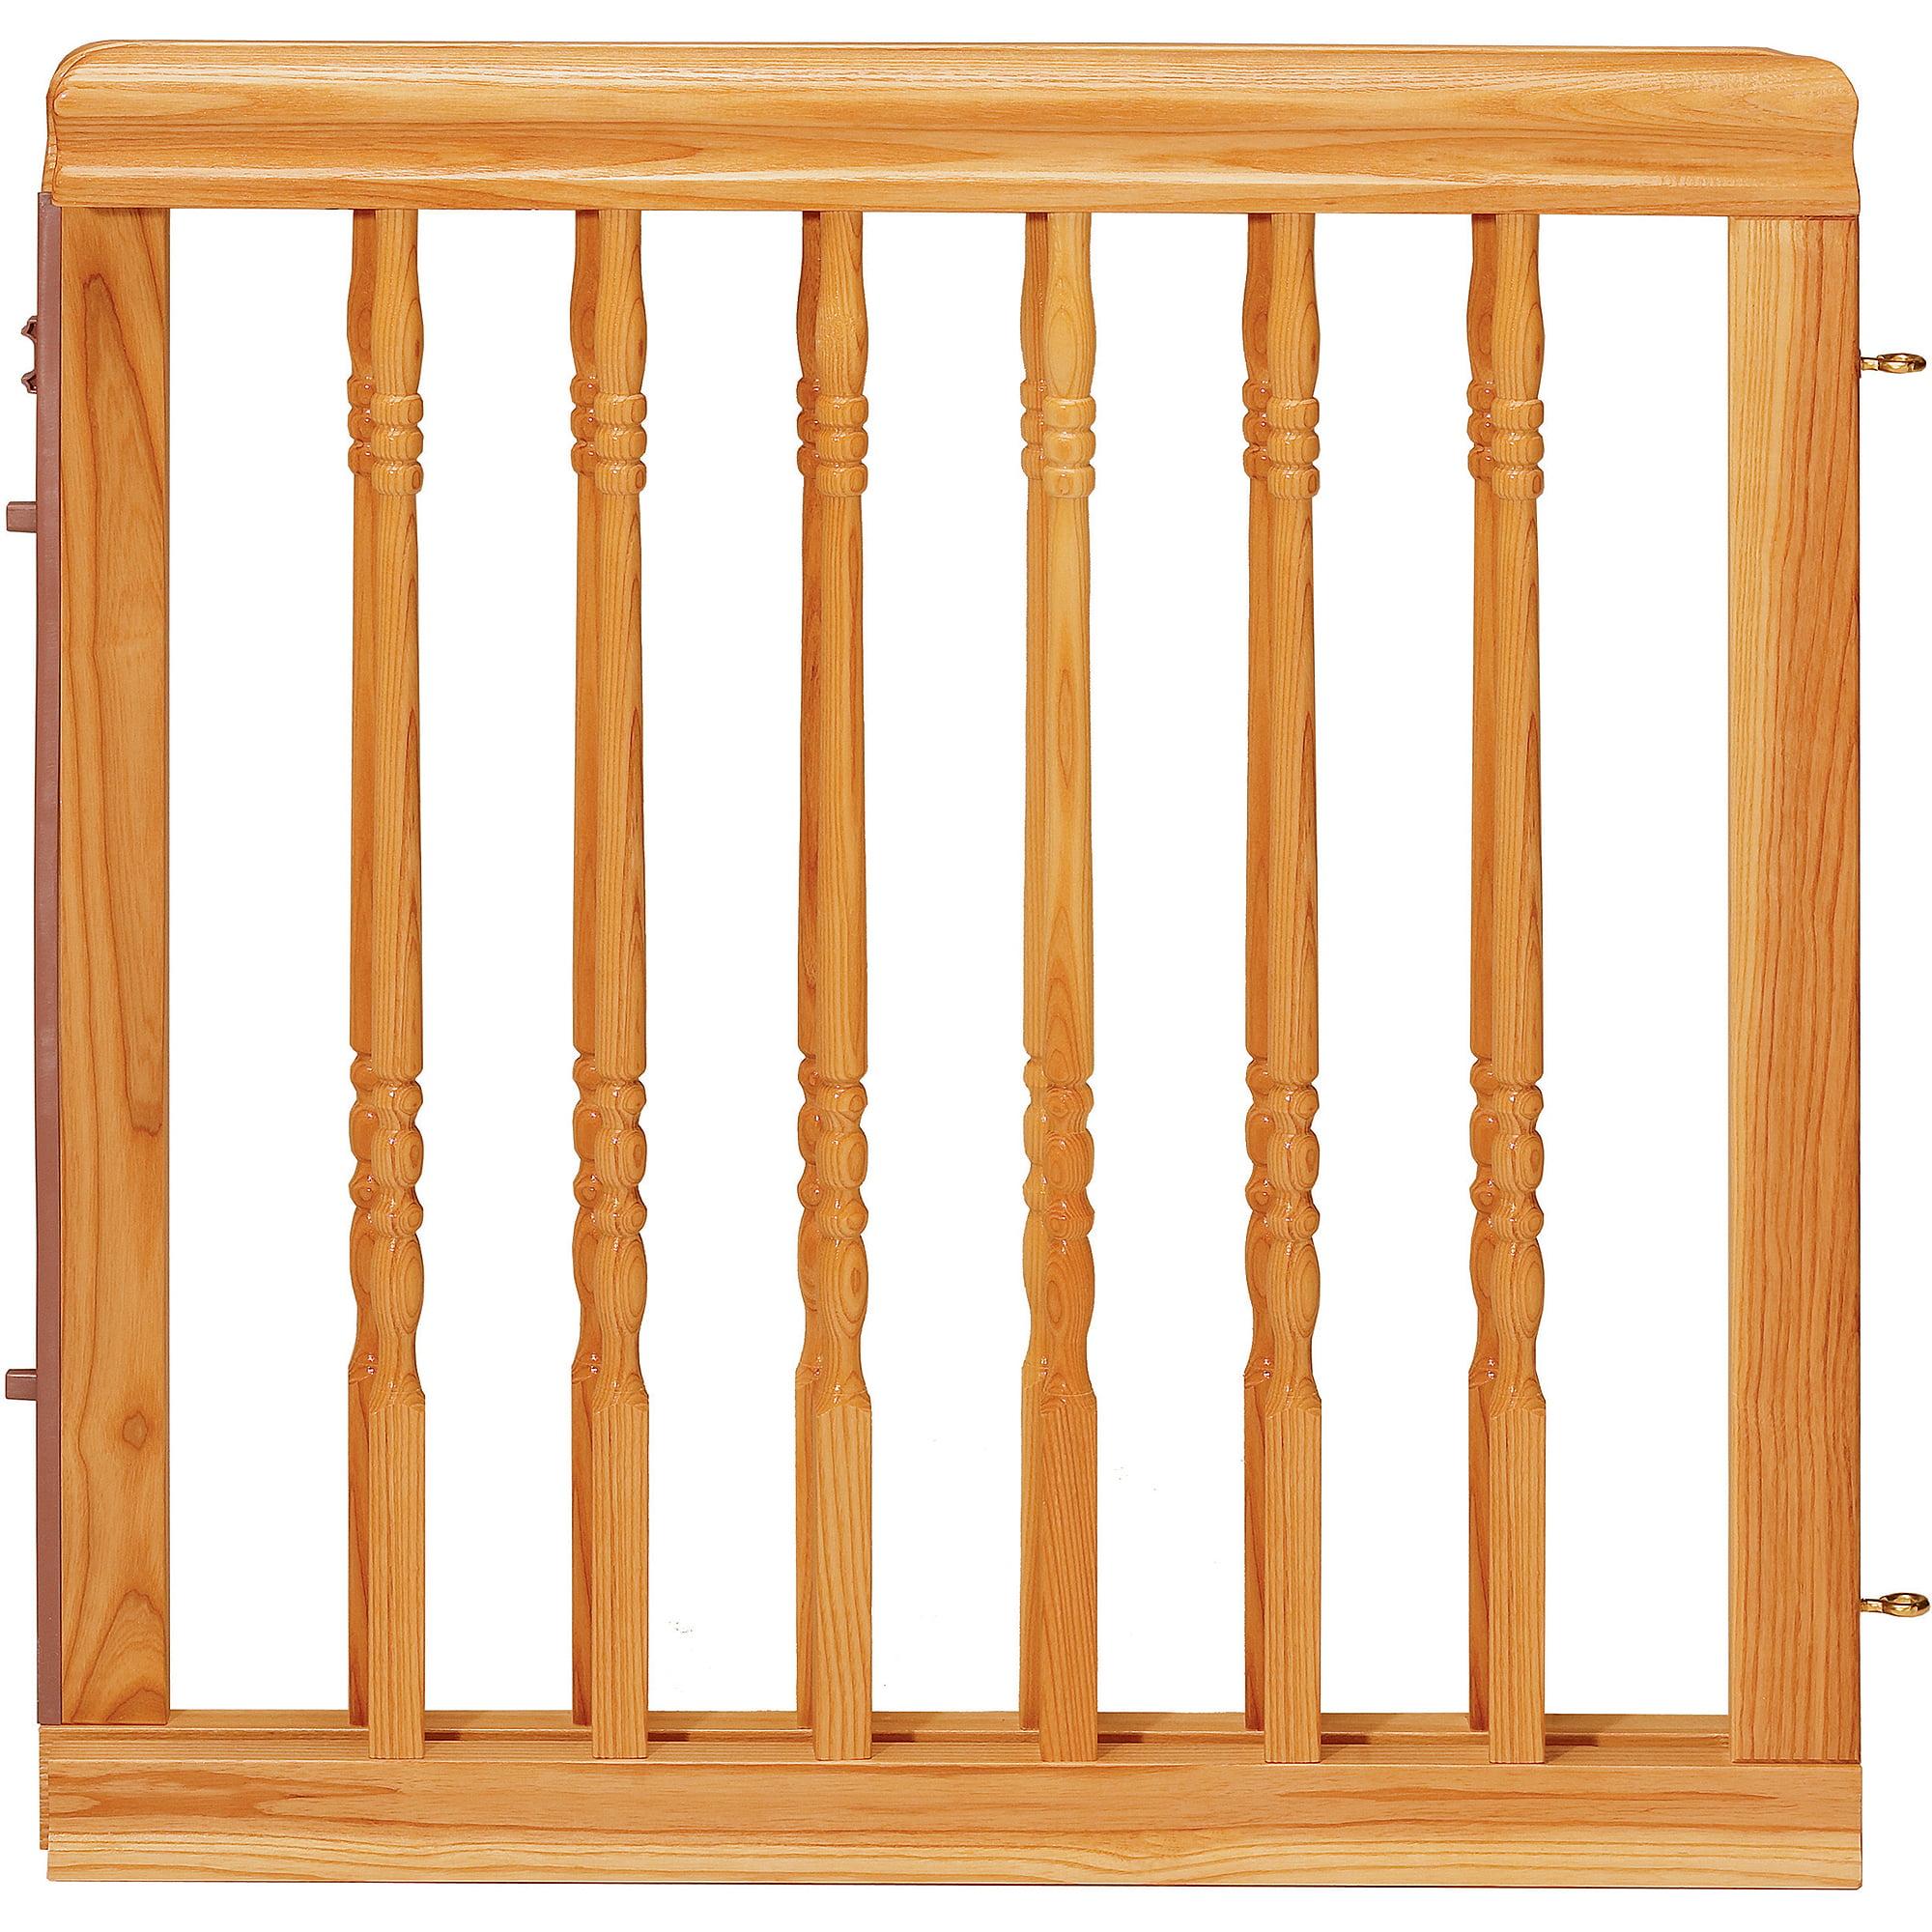 Evenflo Home Decor Wood Swing Gate, Natural Oak